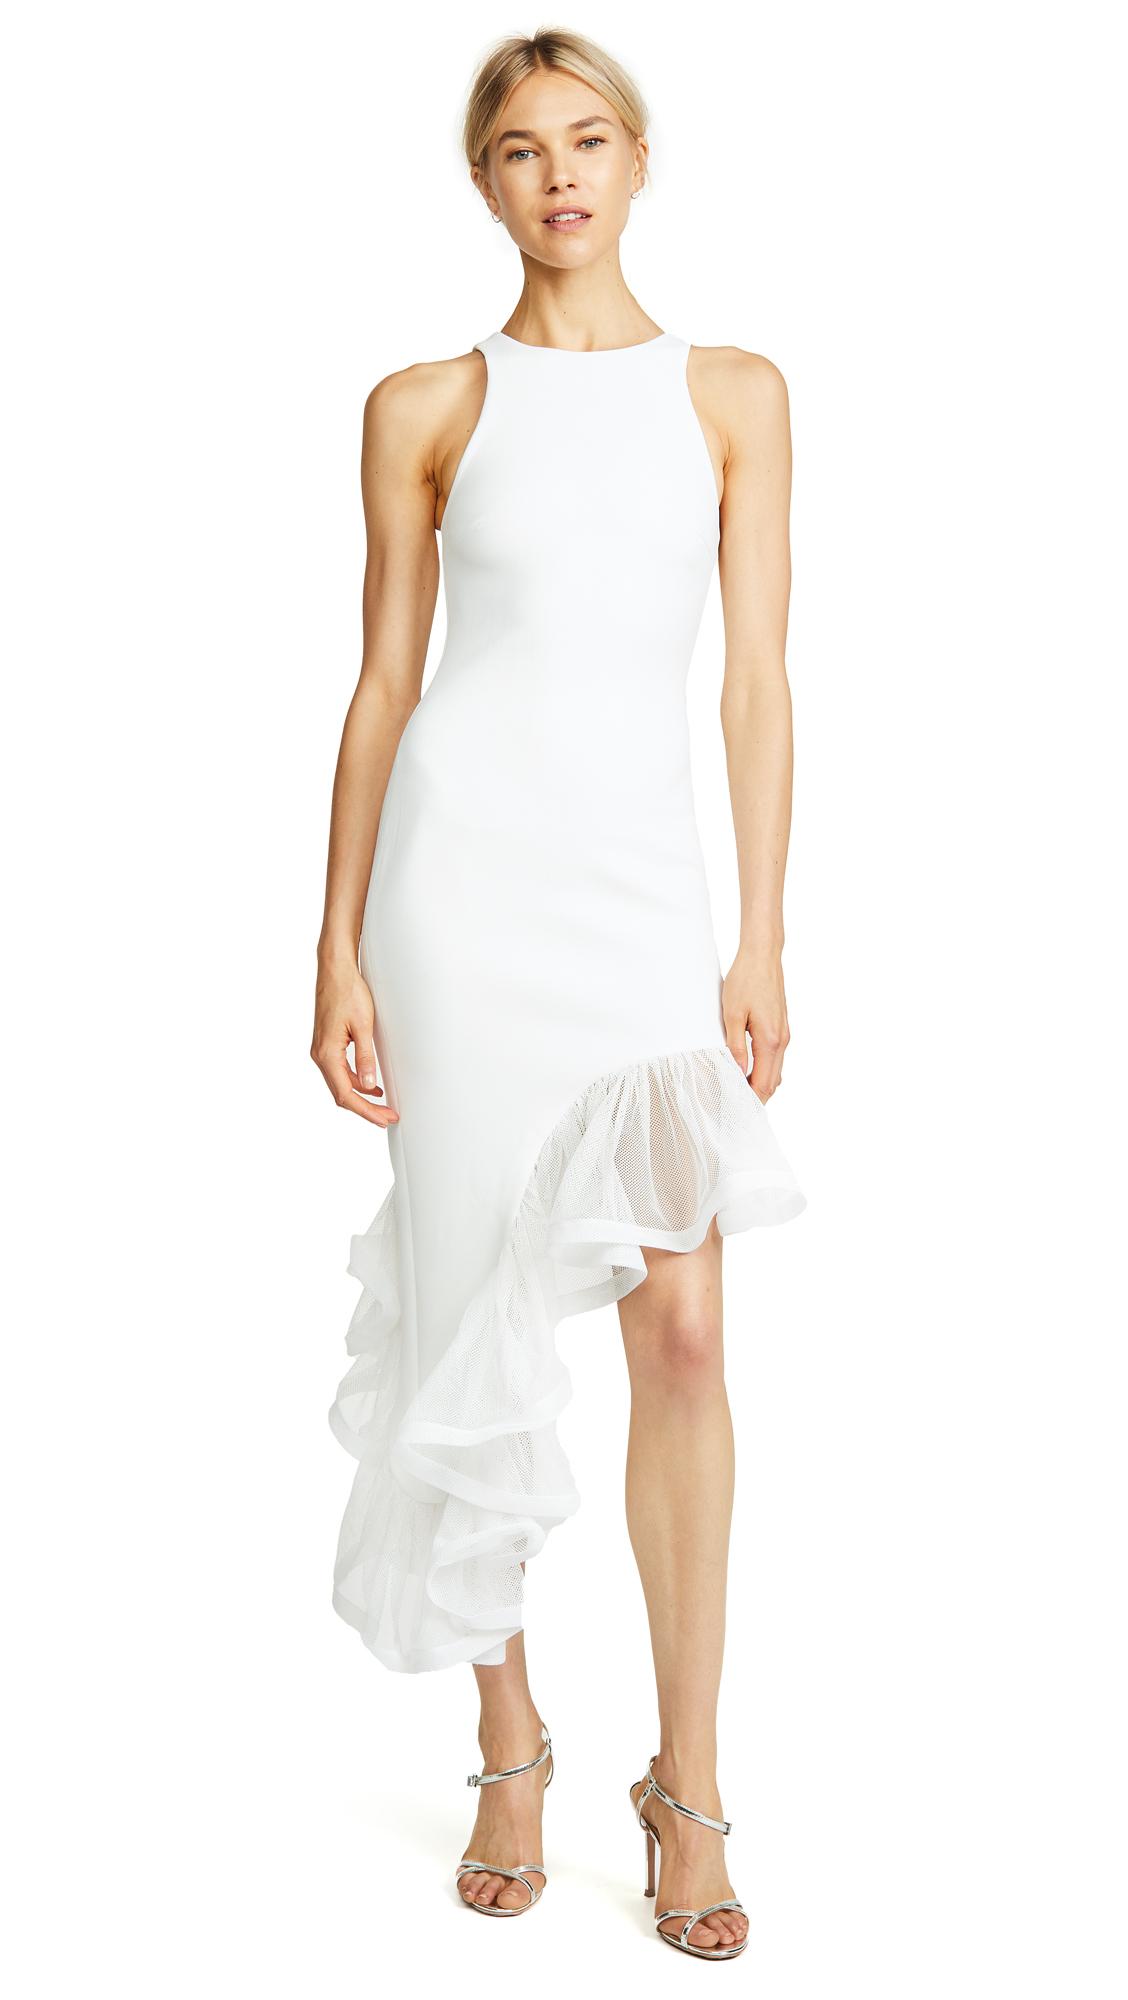 VATANIKA Ruffle Hem Asymmetrical Dress in White